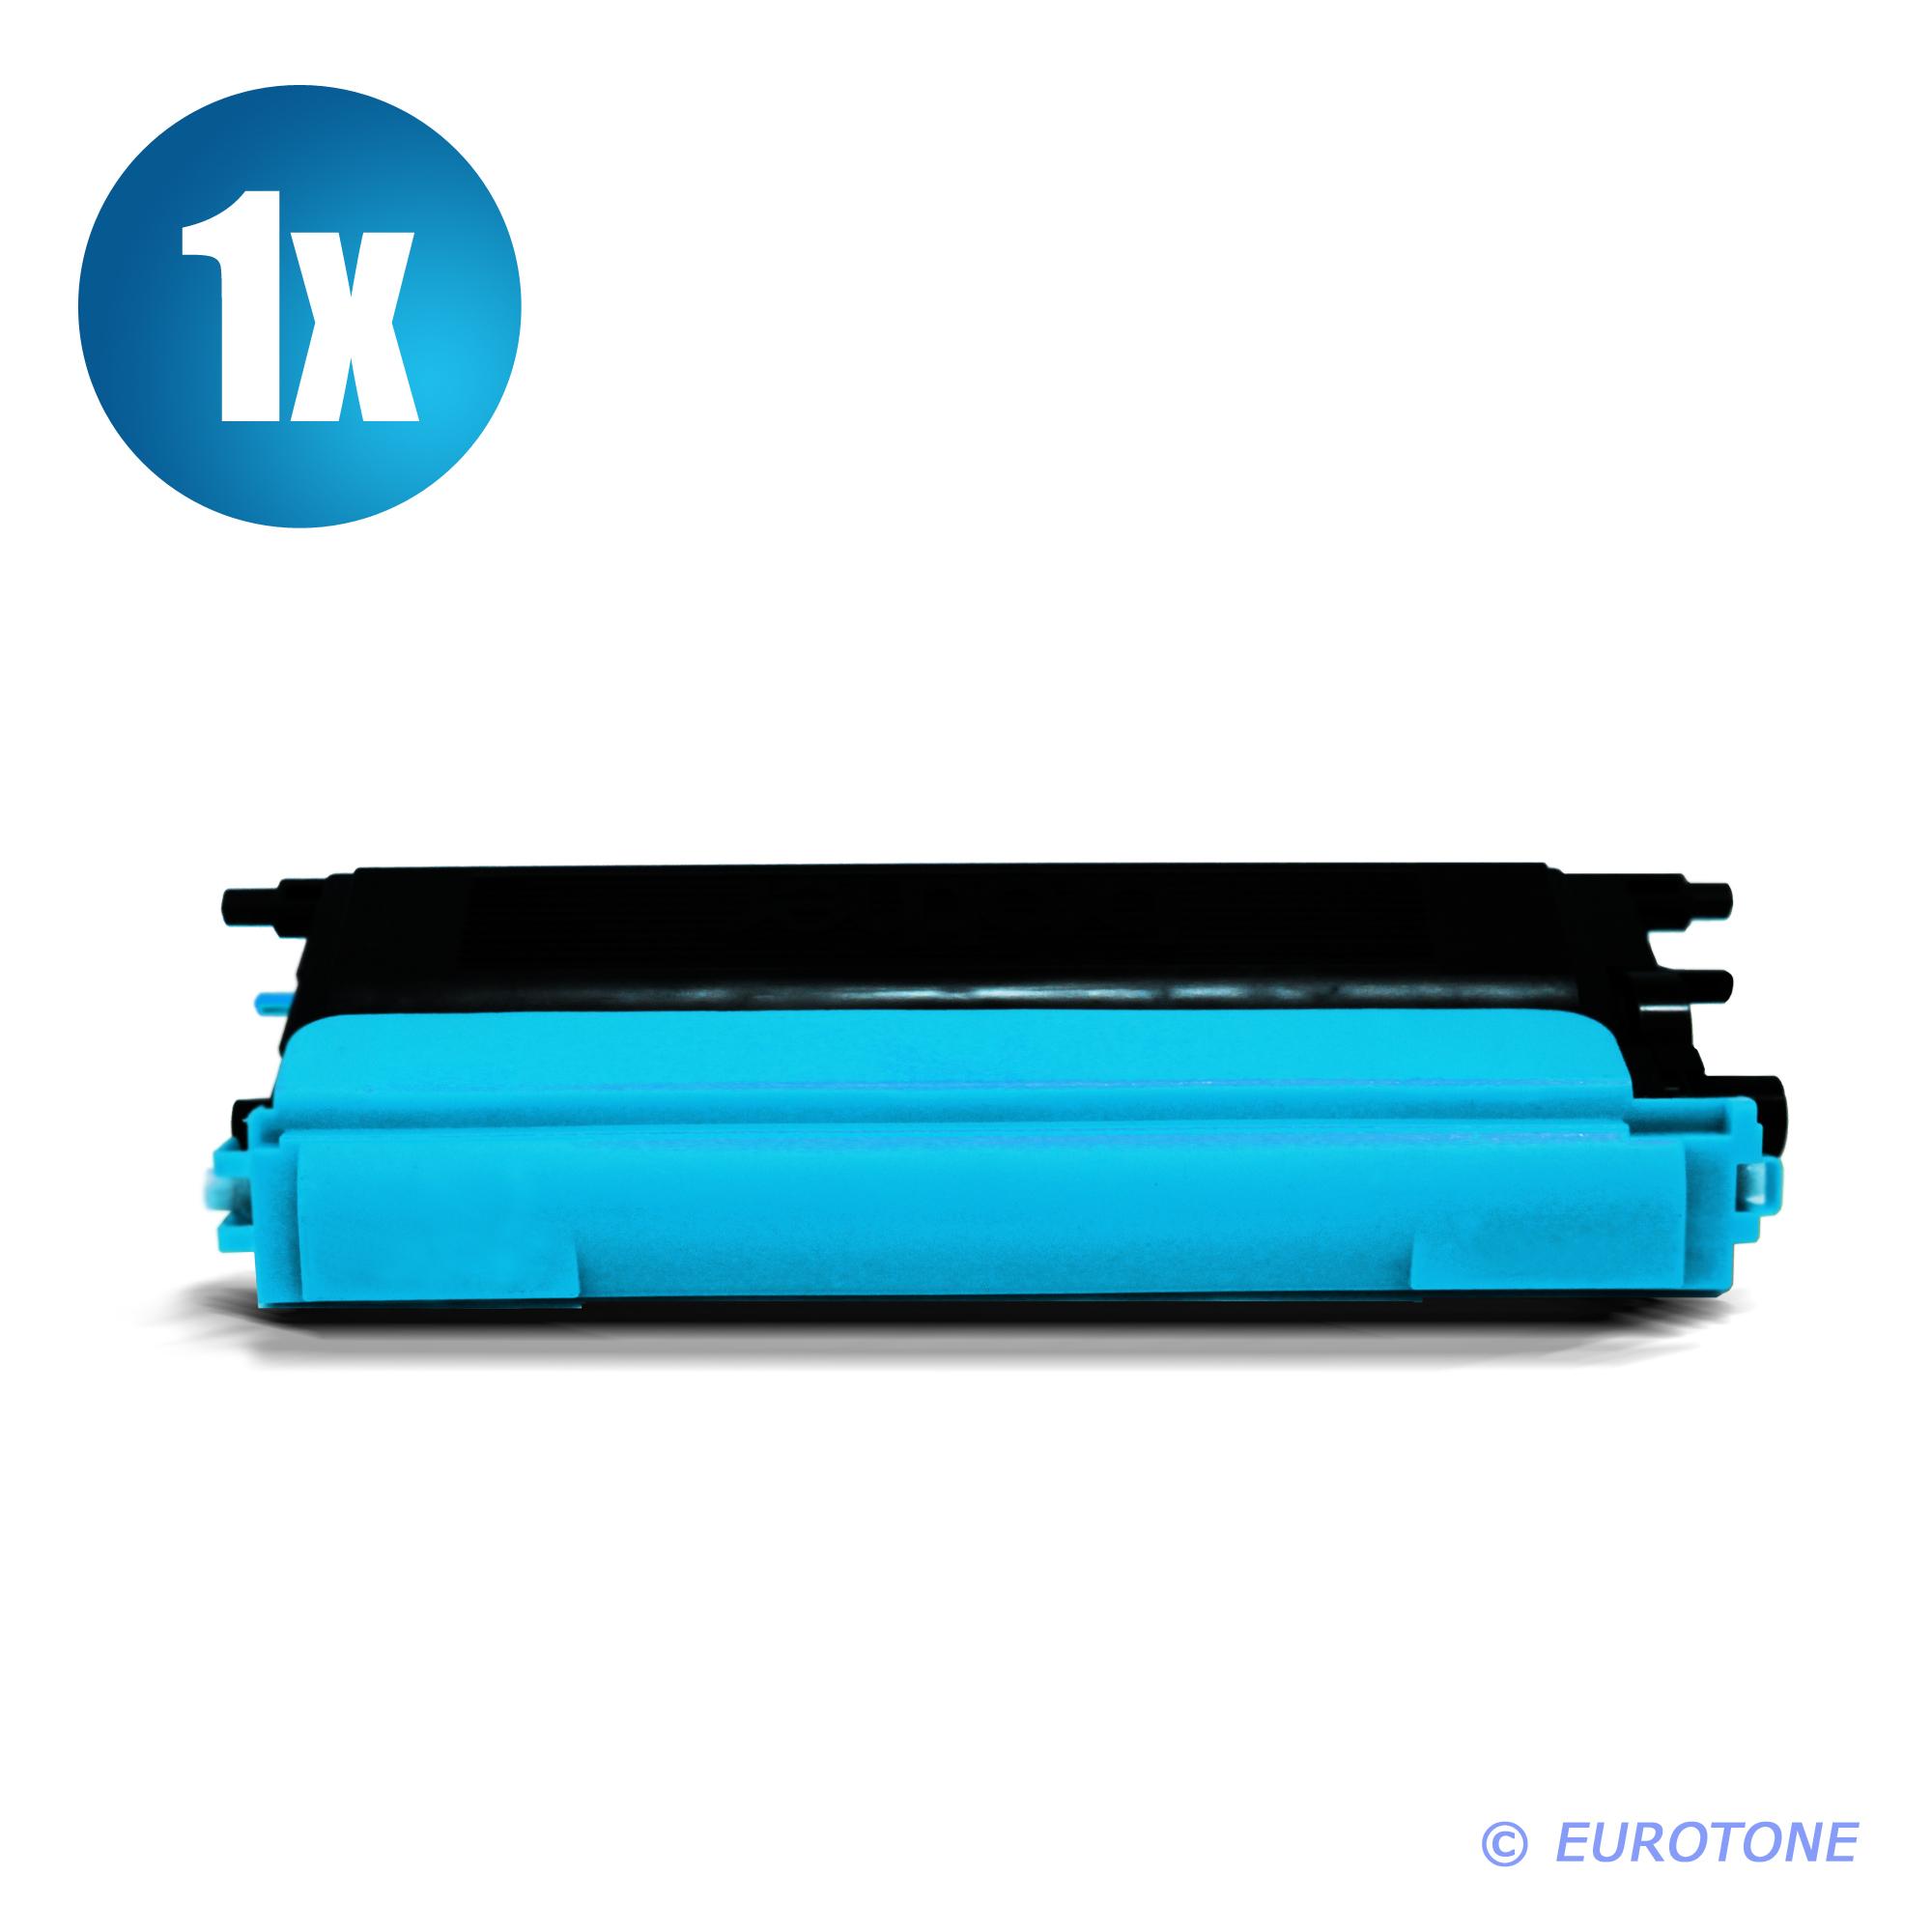 4-Eurotone-Toner-fuer-Brother-DCP9042CDN-DCP9040CN-HL4050CDNLT-TN-135-CMYK